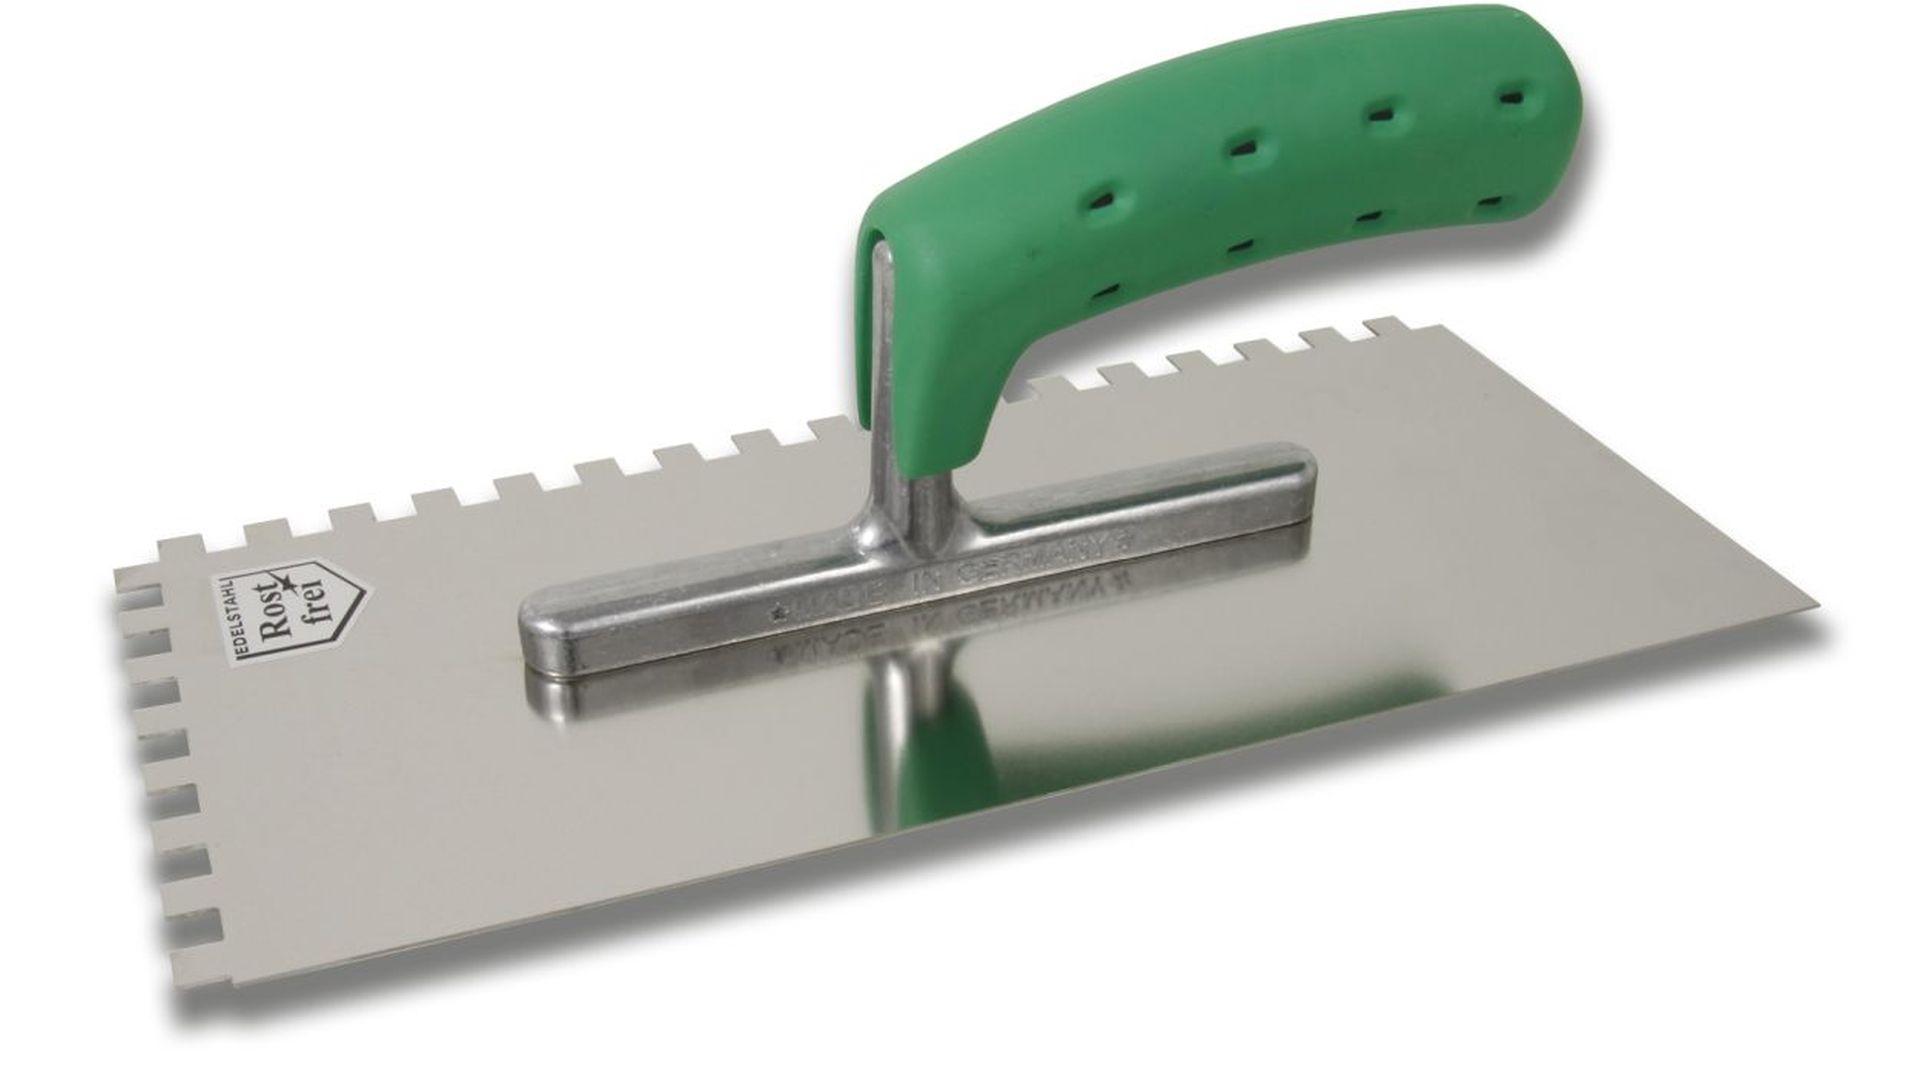 HUFA Glättekelle mit 2K Soft Griff, Zahnung 4 x 4 mm, 130 x 280 mm